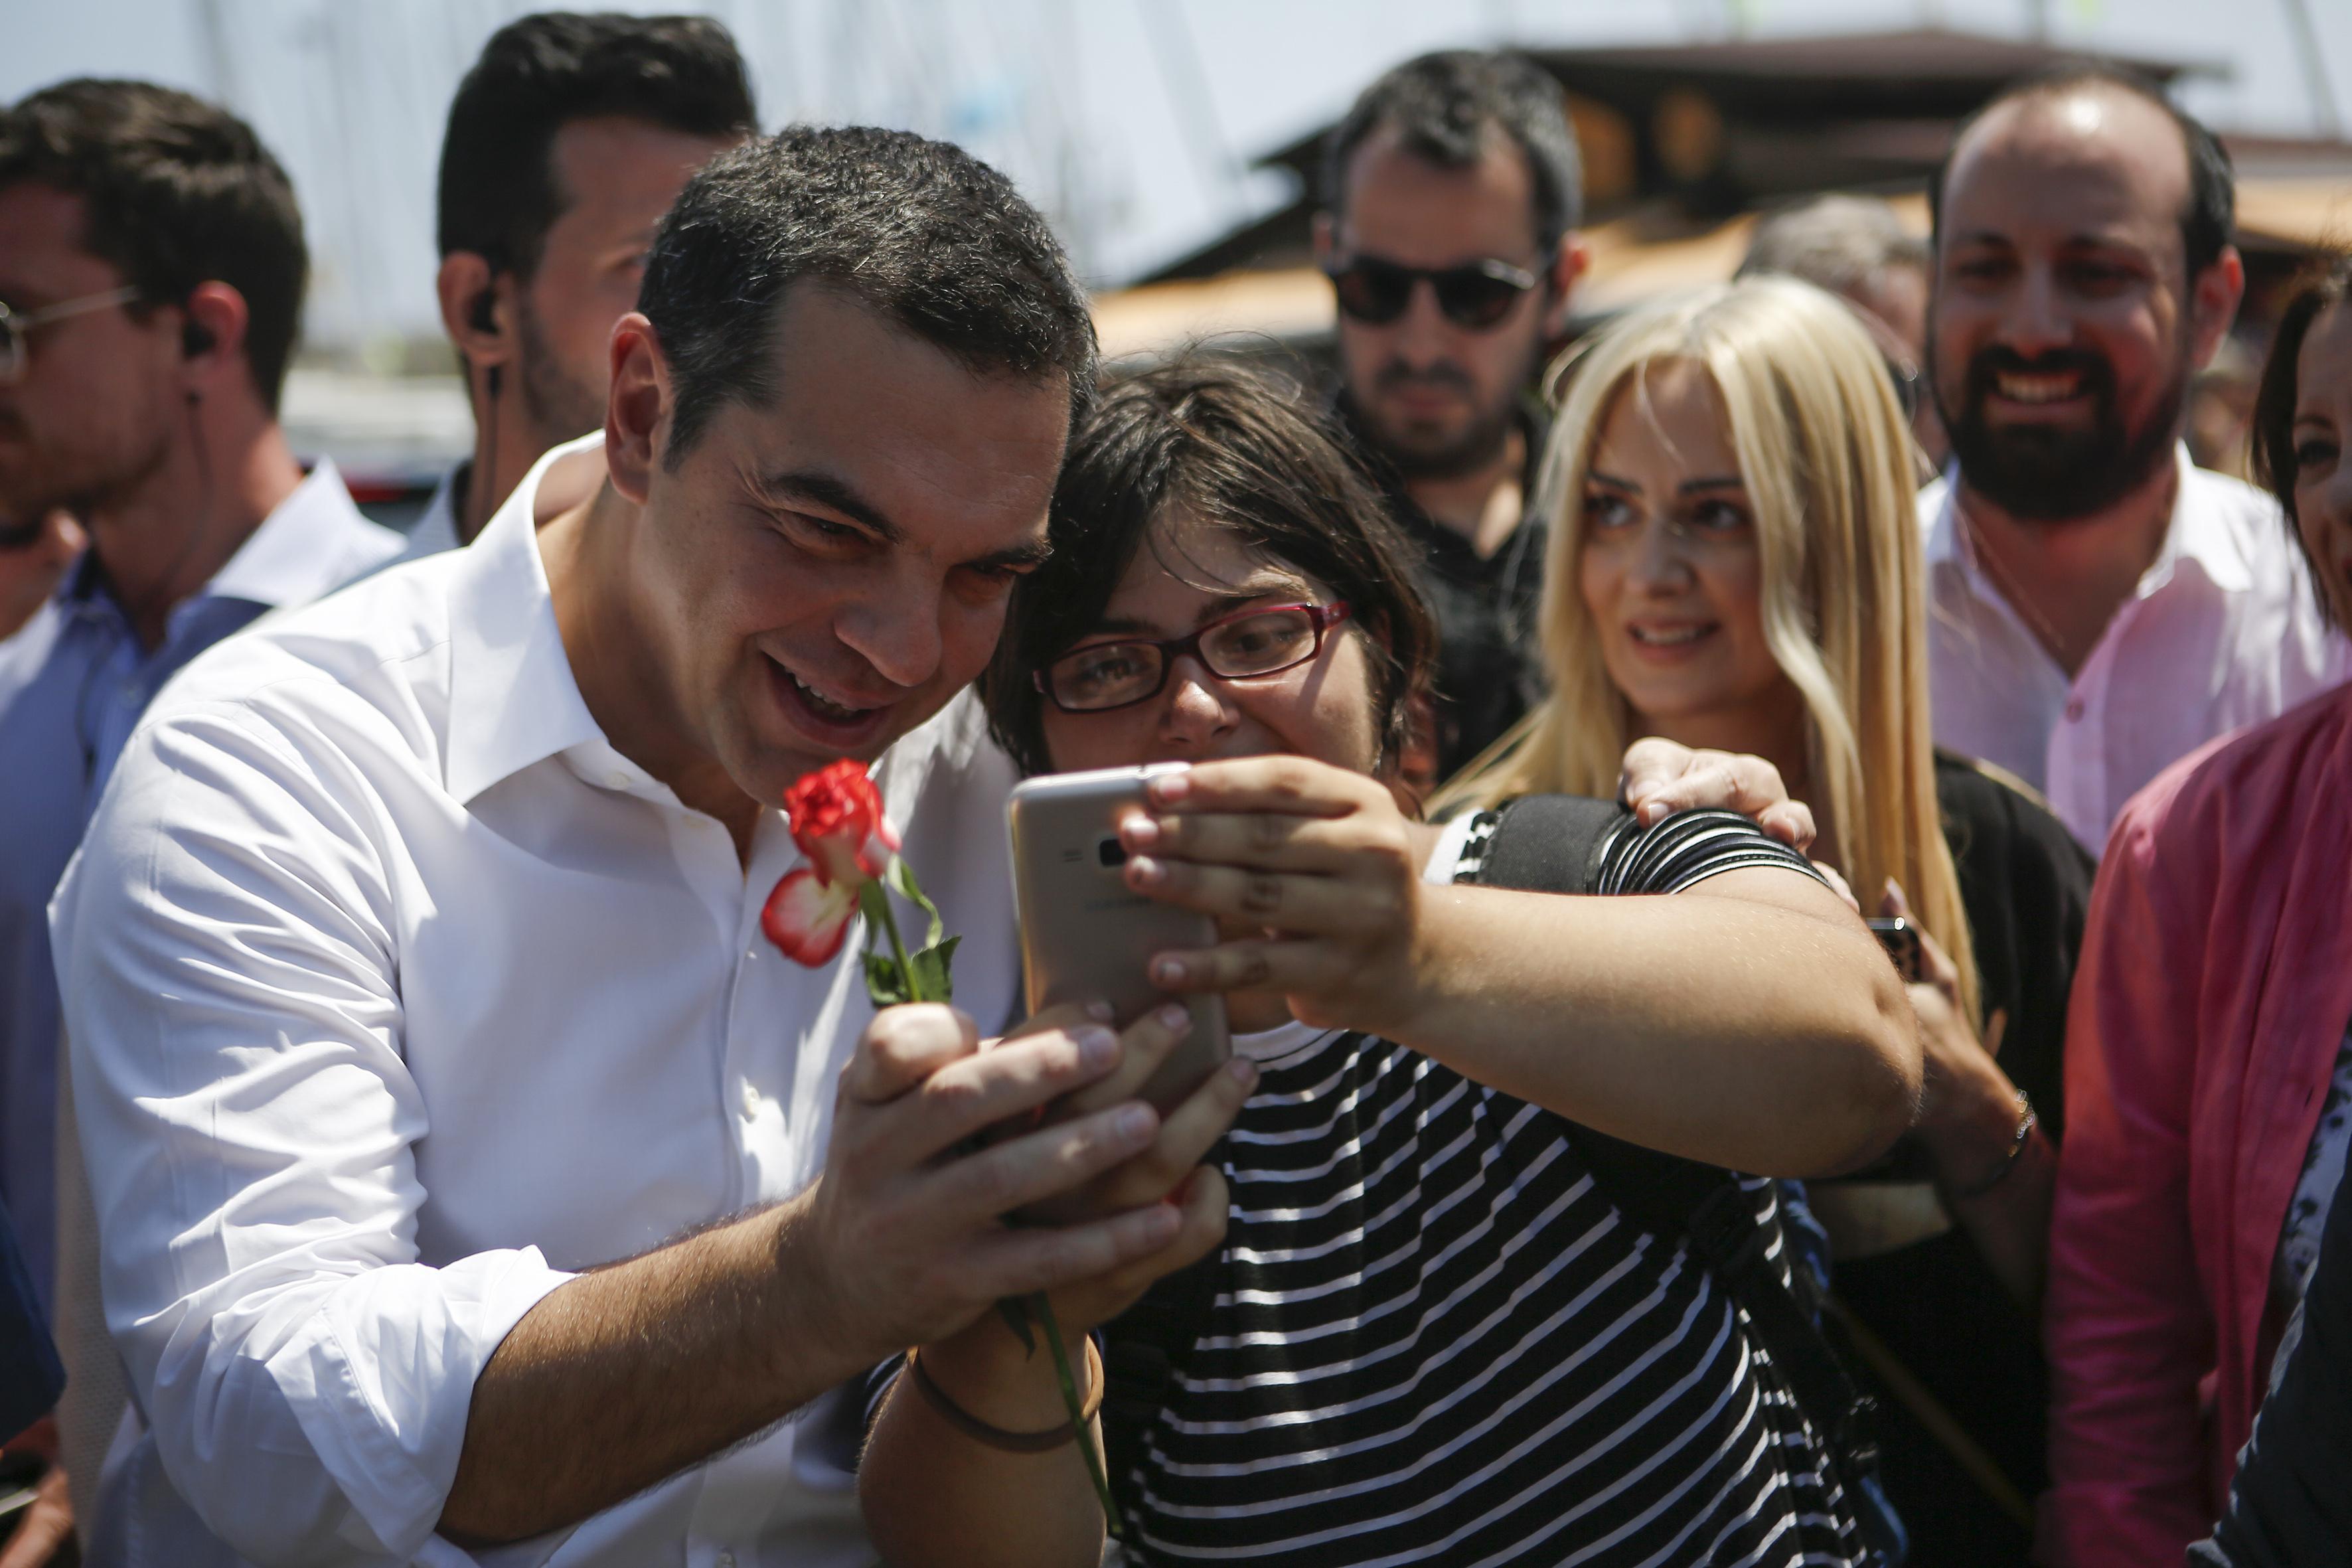 se-taverna-sto-layrio-to-proeklogiko-geyma-tsipra-vinteo-fotografies13